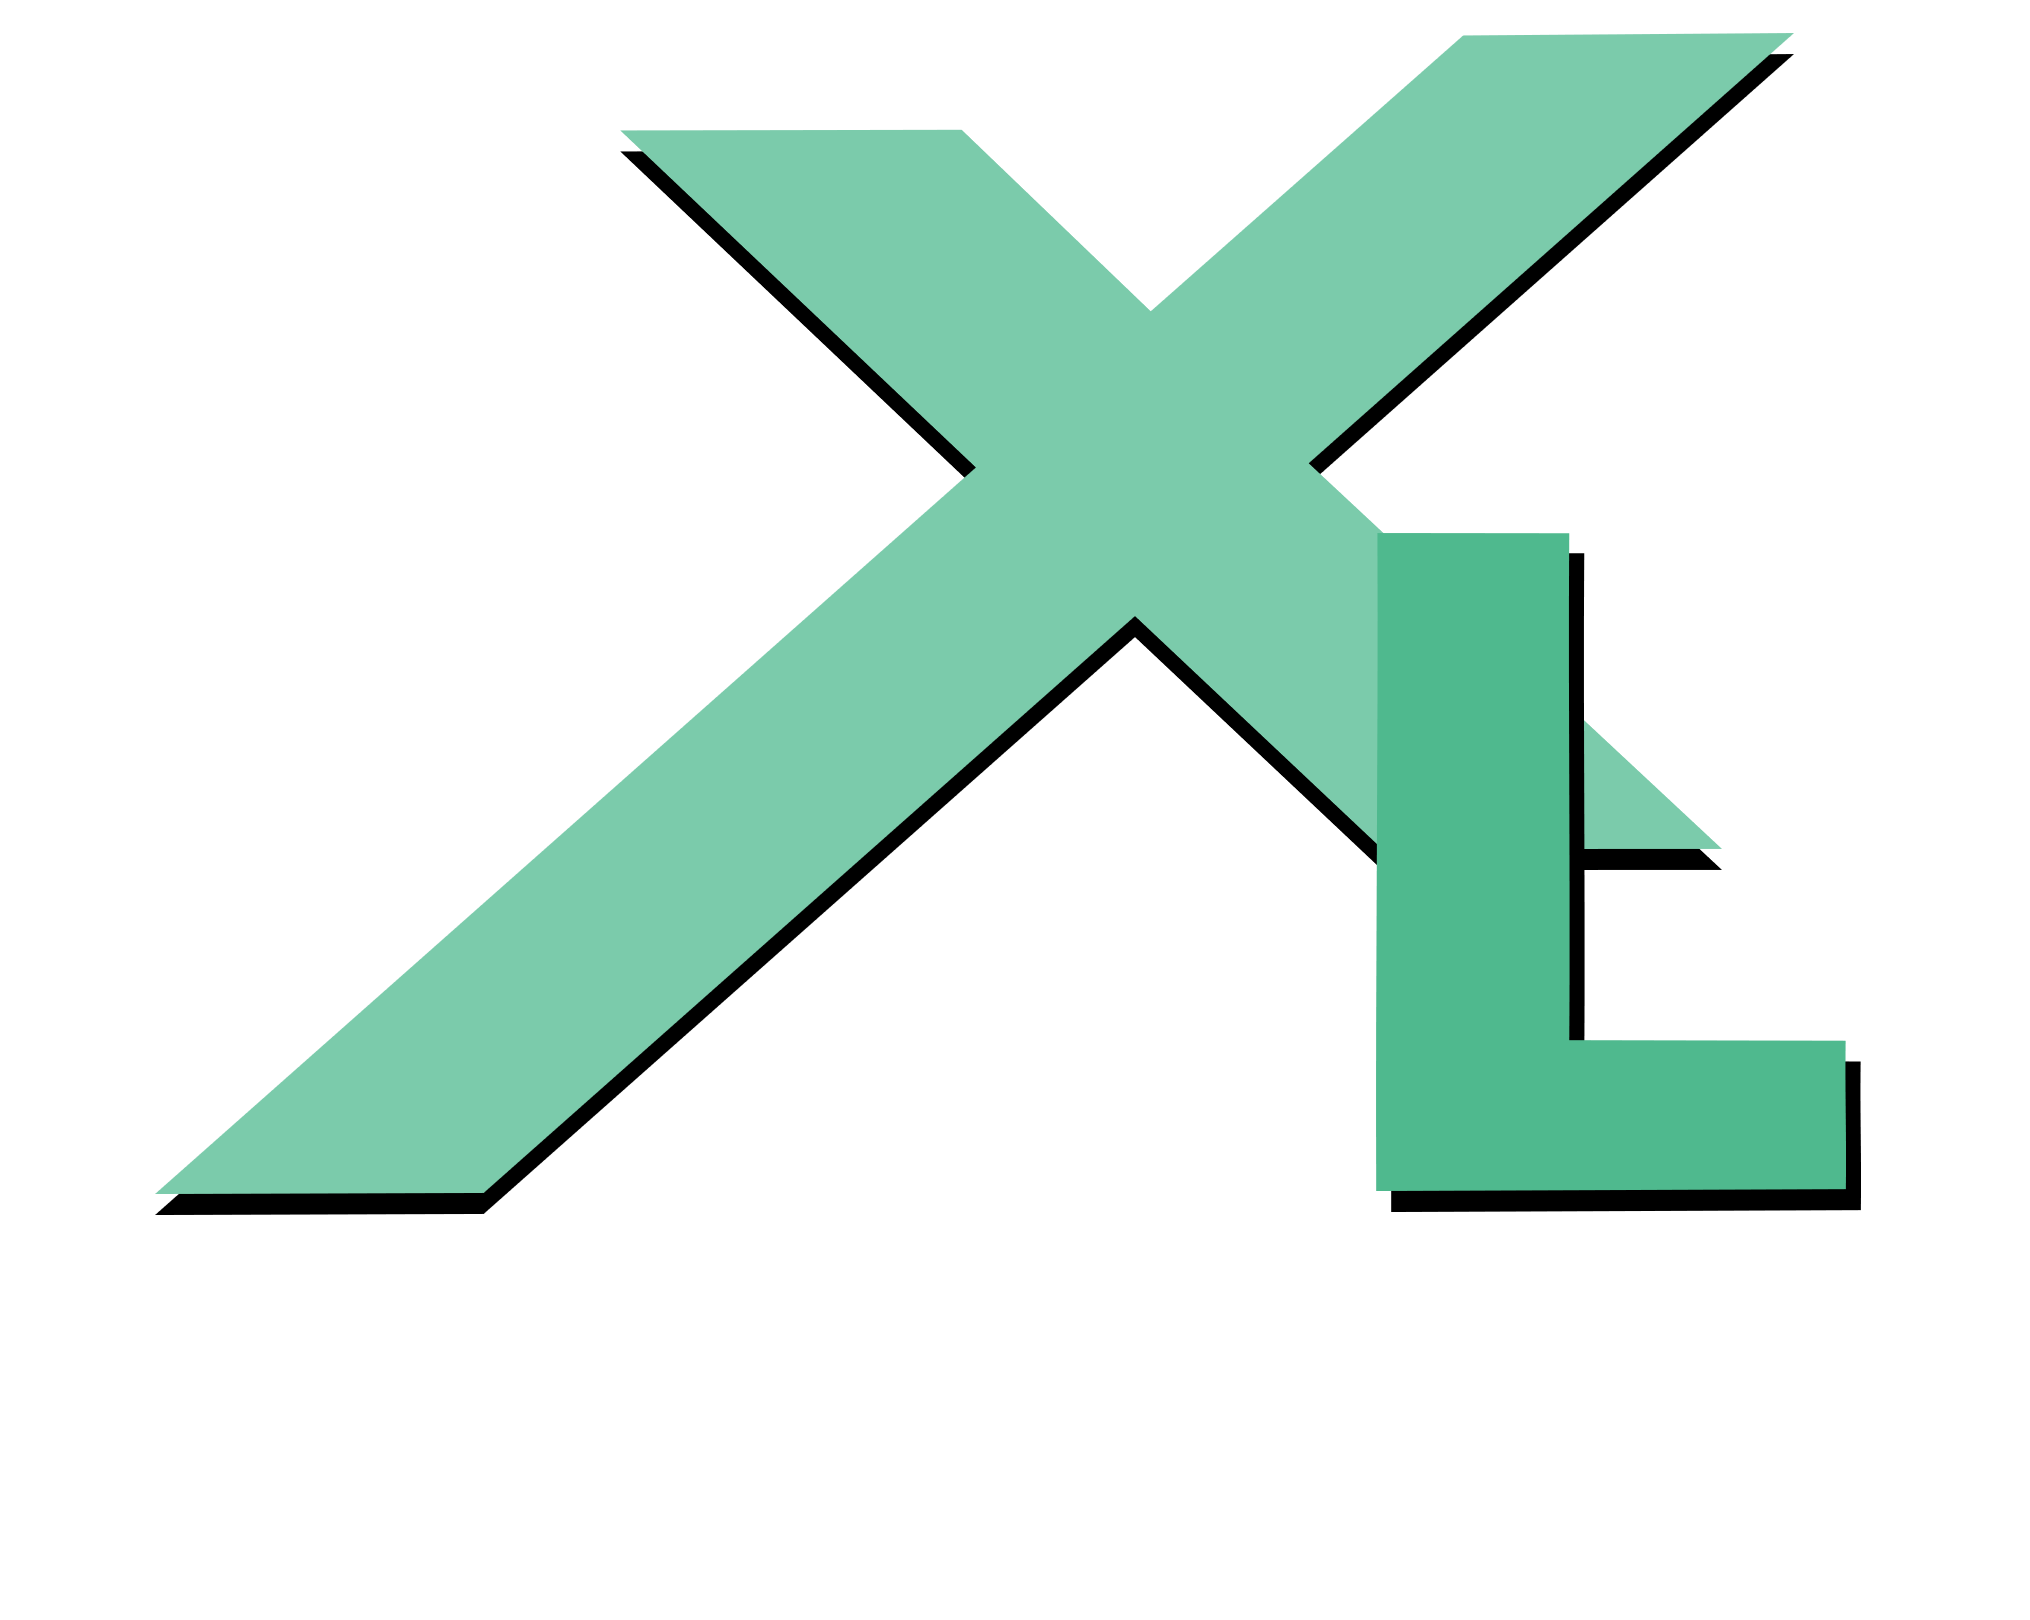 Nuevo Logo eXternal soLutio. 2030x1620